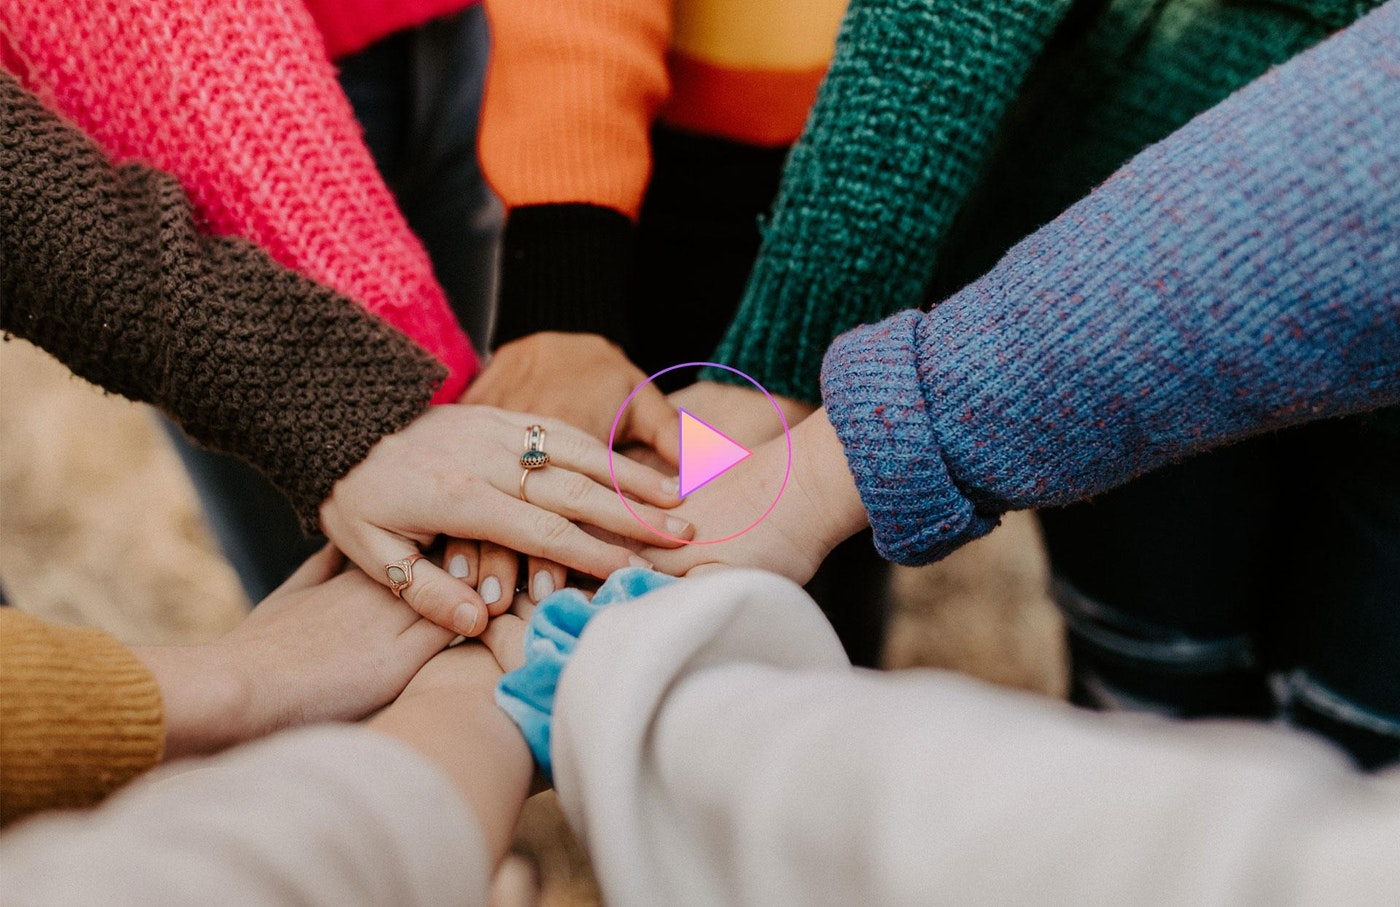 Girl friends hands piled together